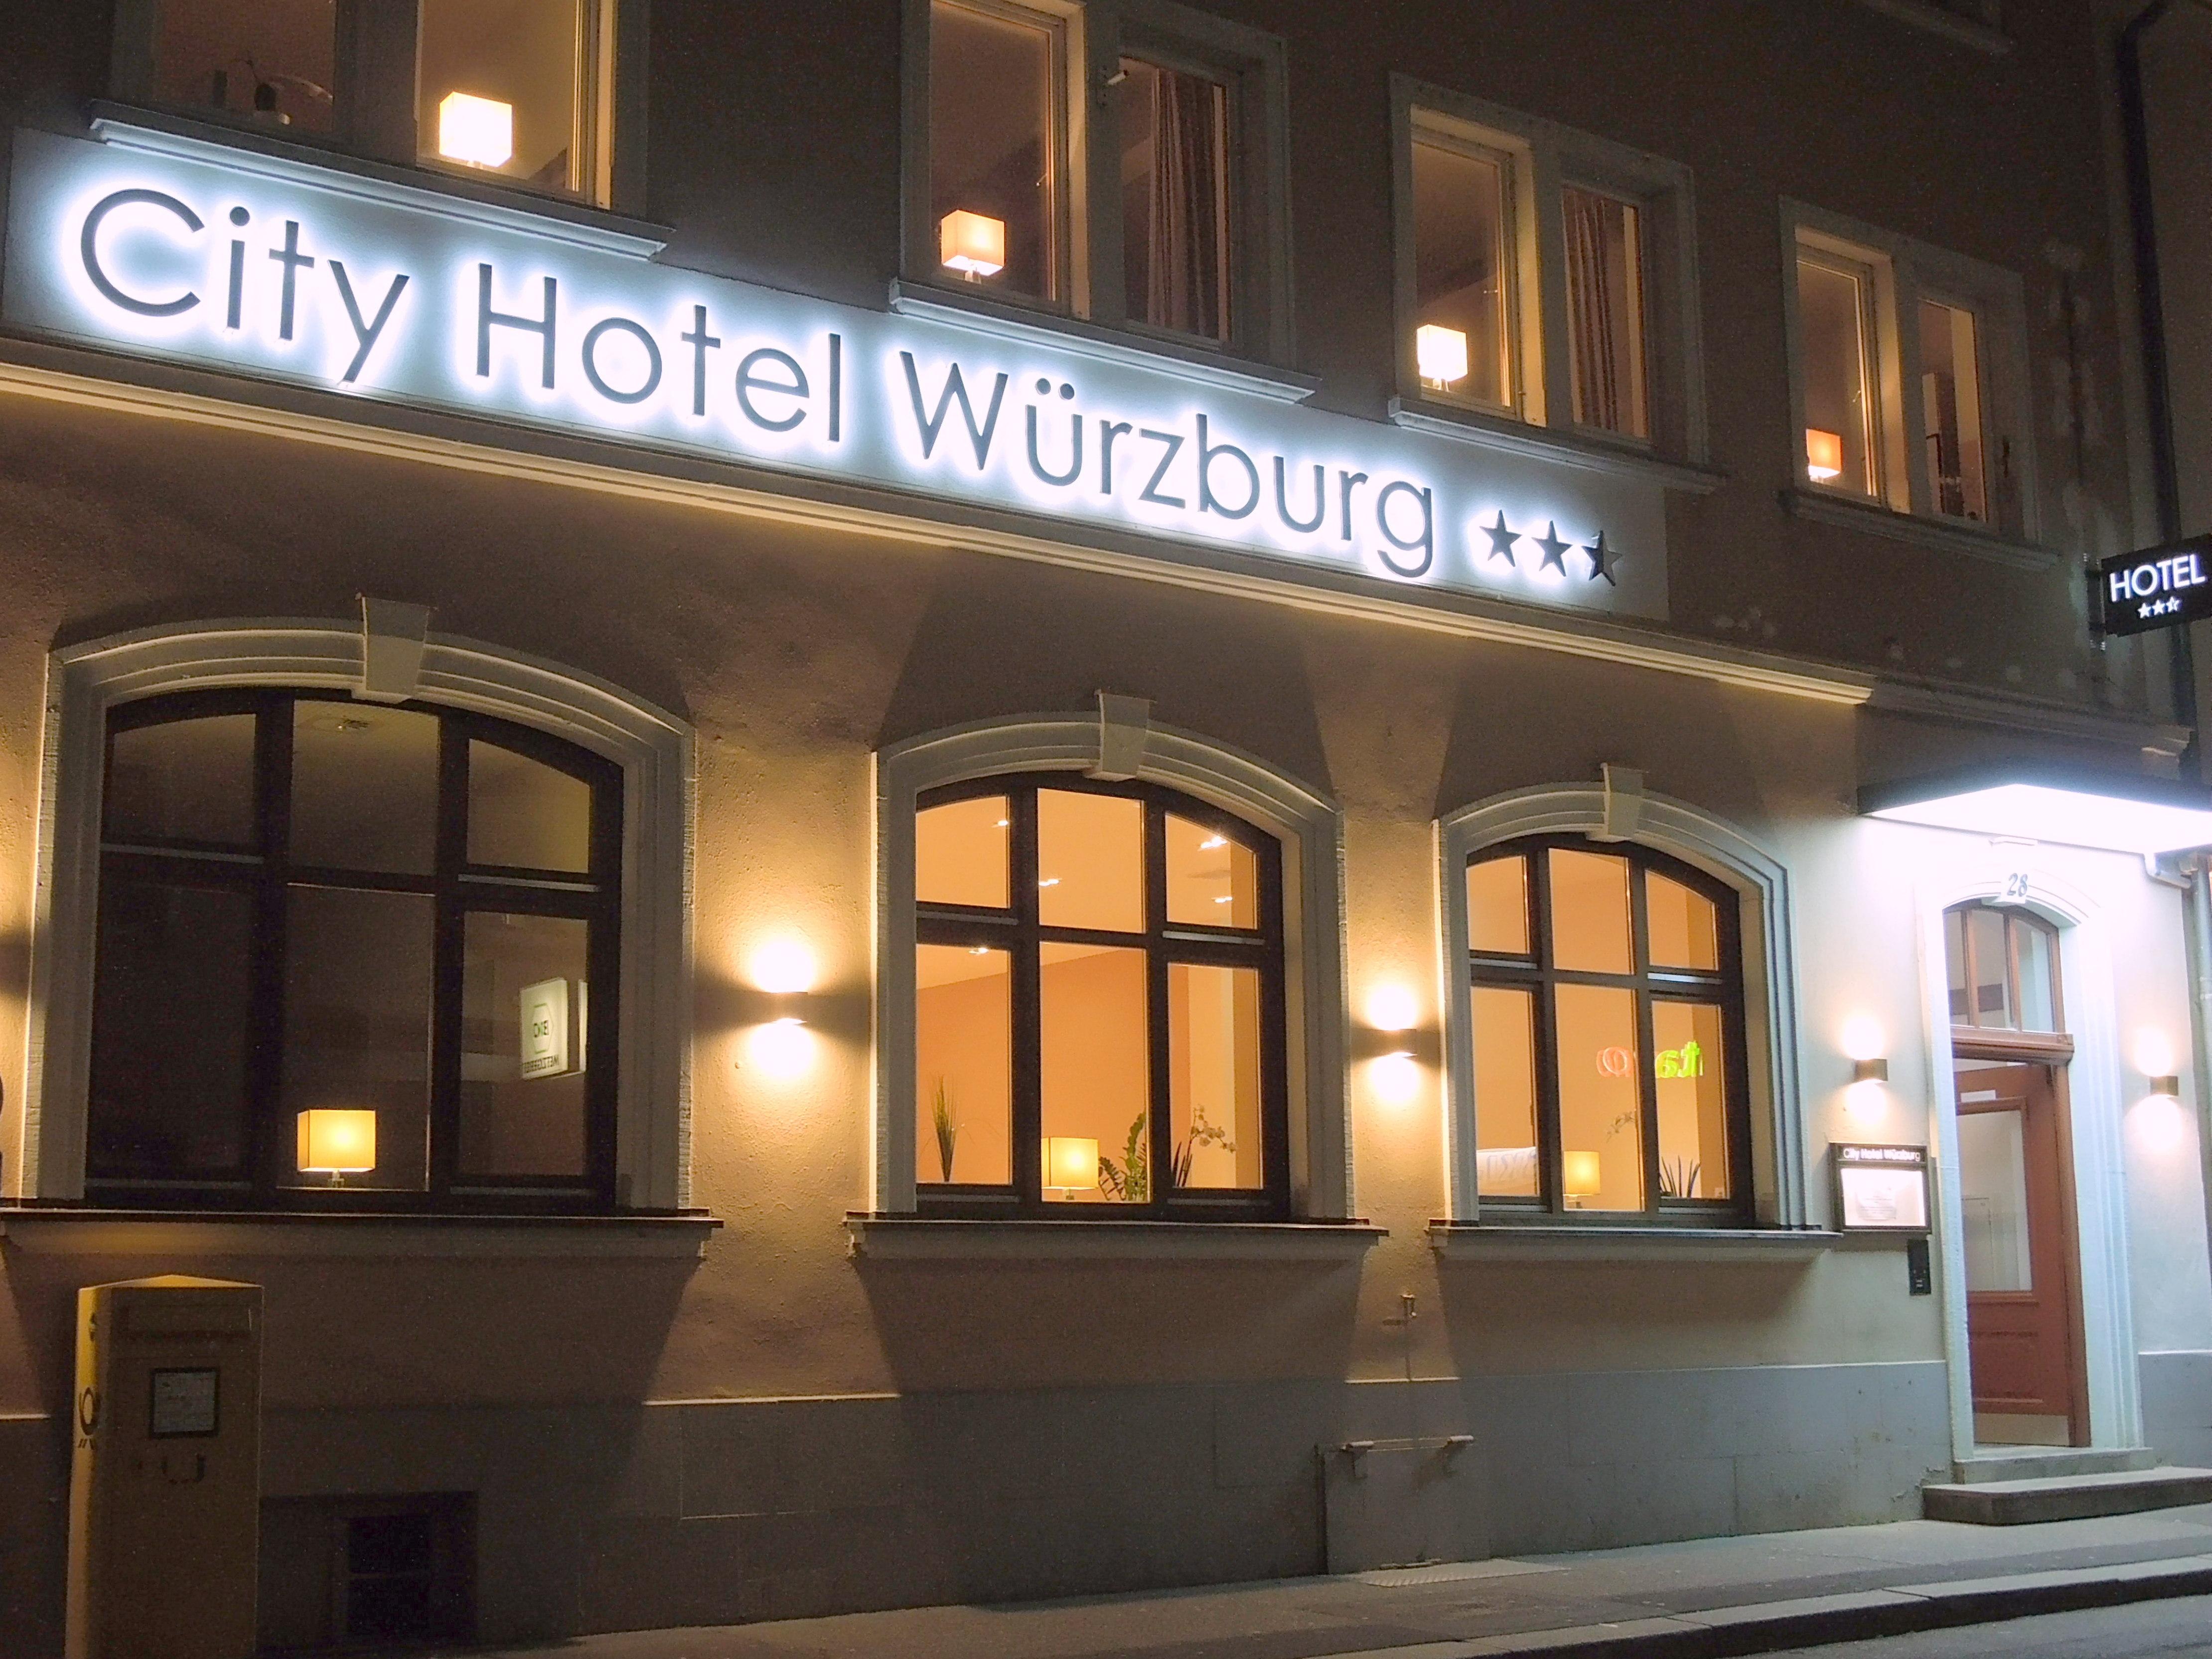 City Hotel Würzburg-City Hotel Würzburg